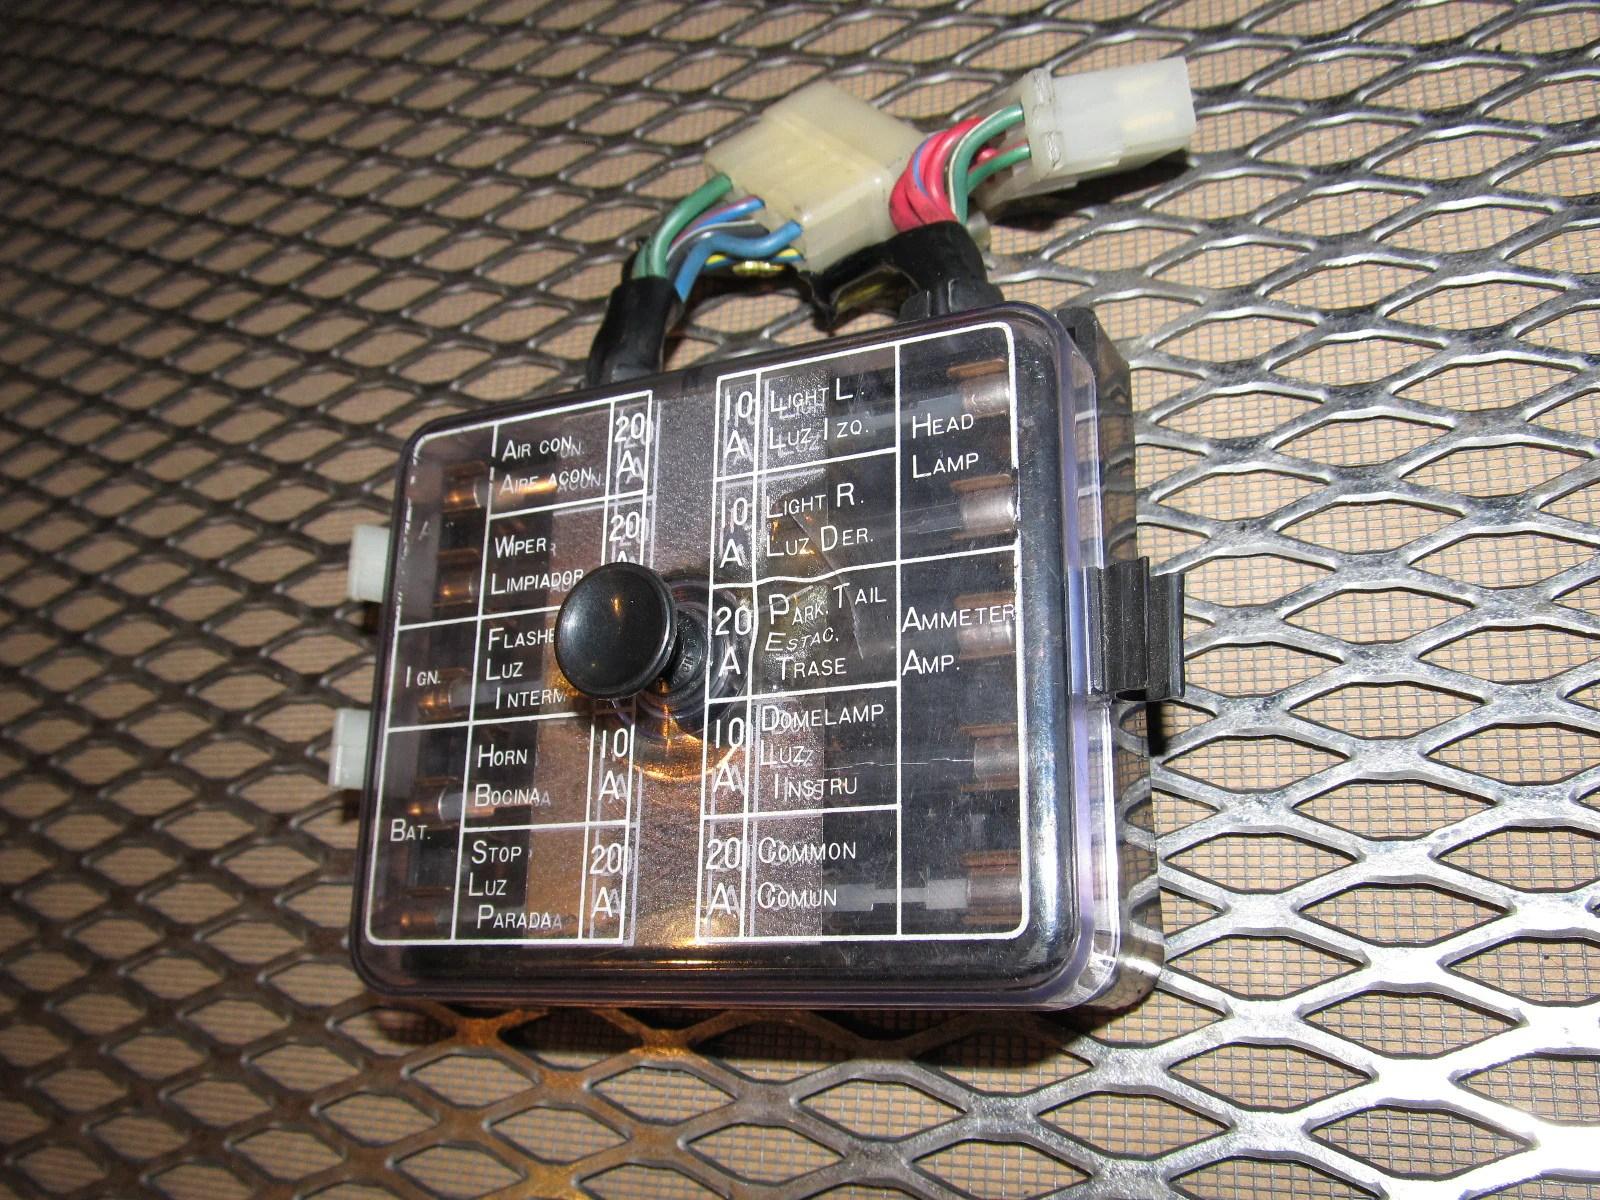 hight resolution of  72 73 datsun 240z oem interior fuse box